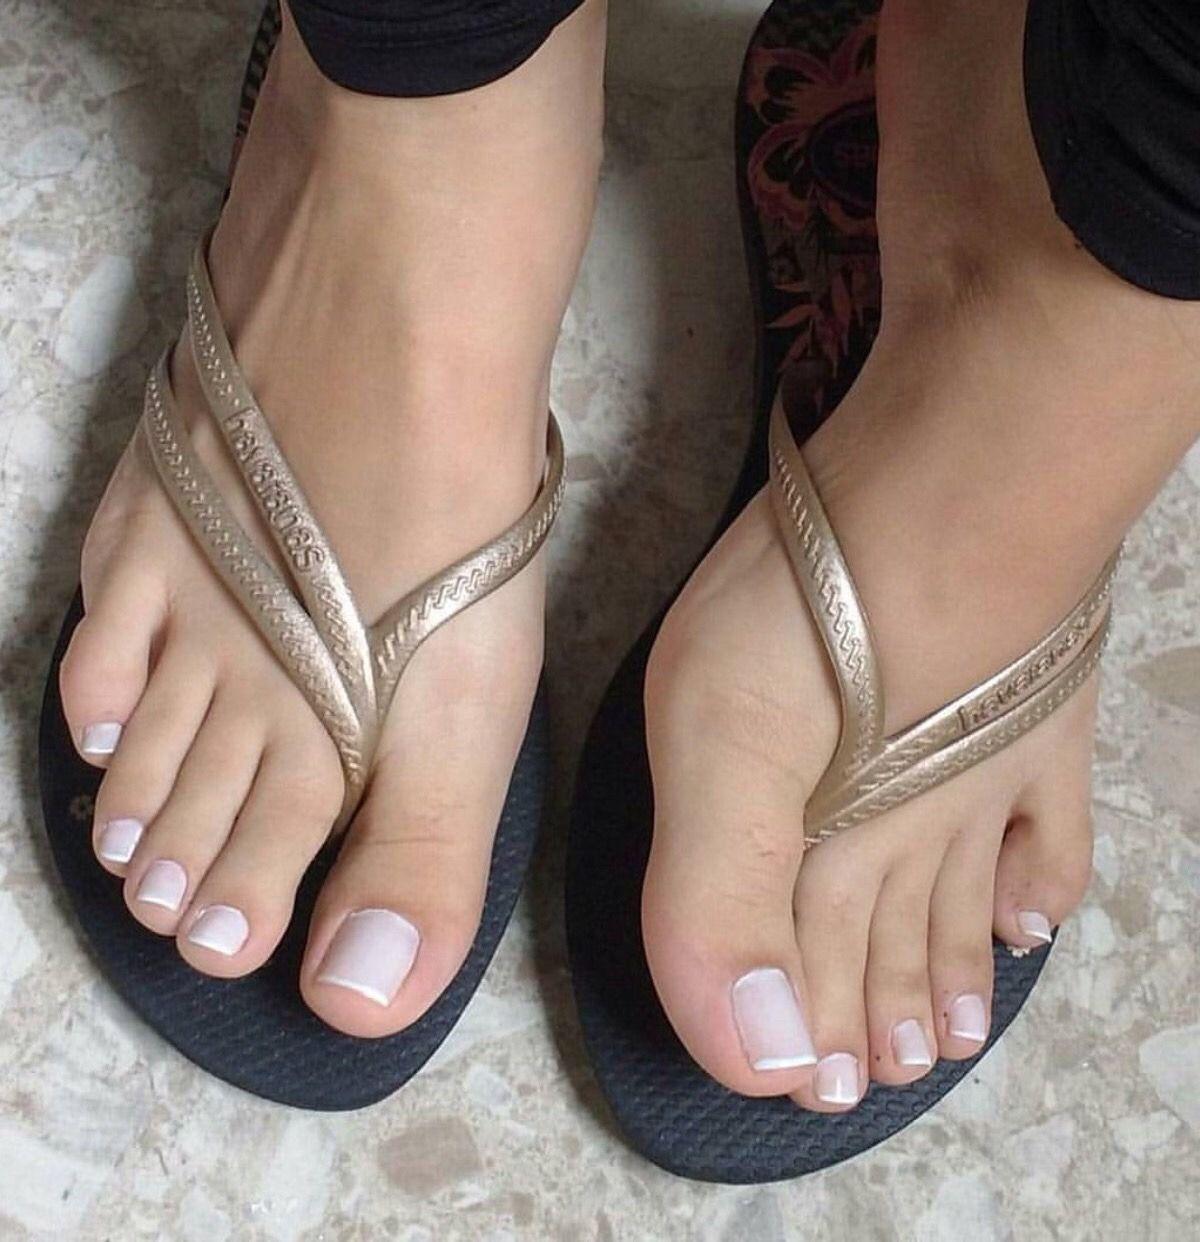 Feet pics female At Her